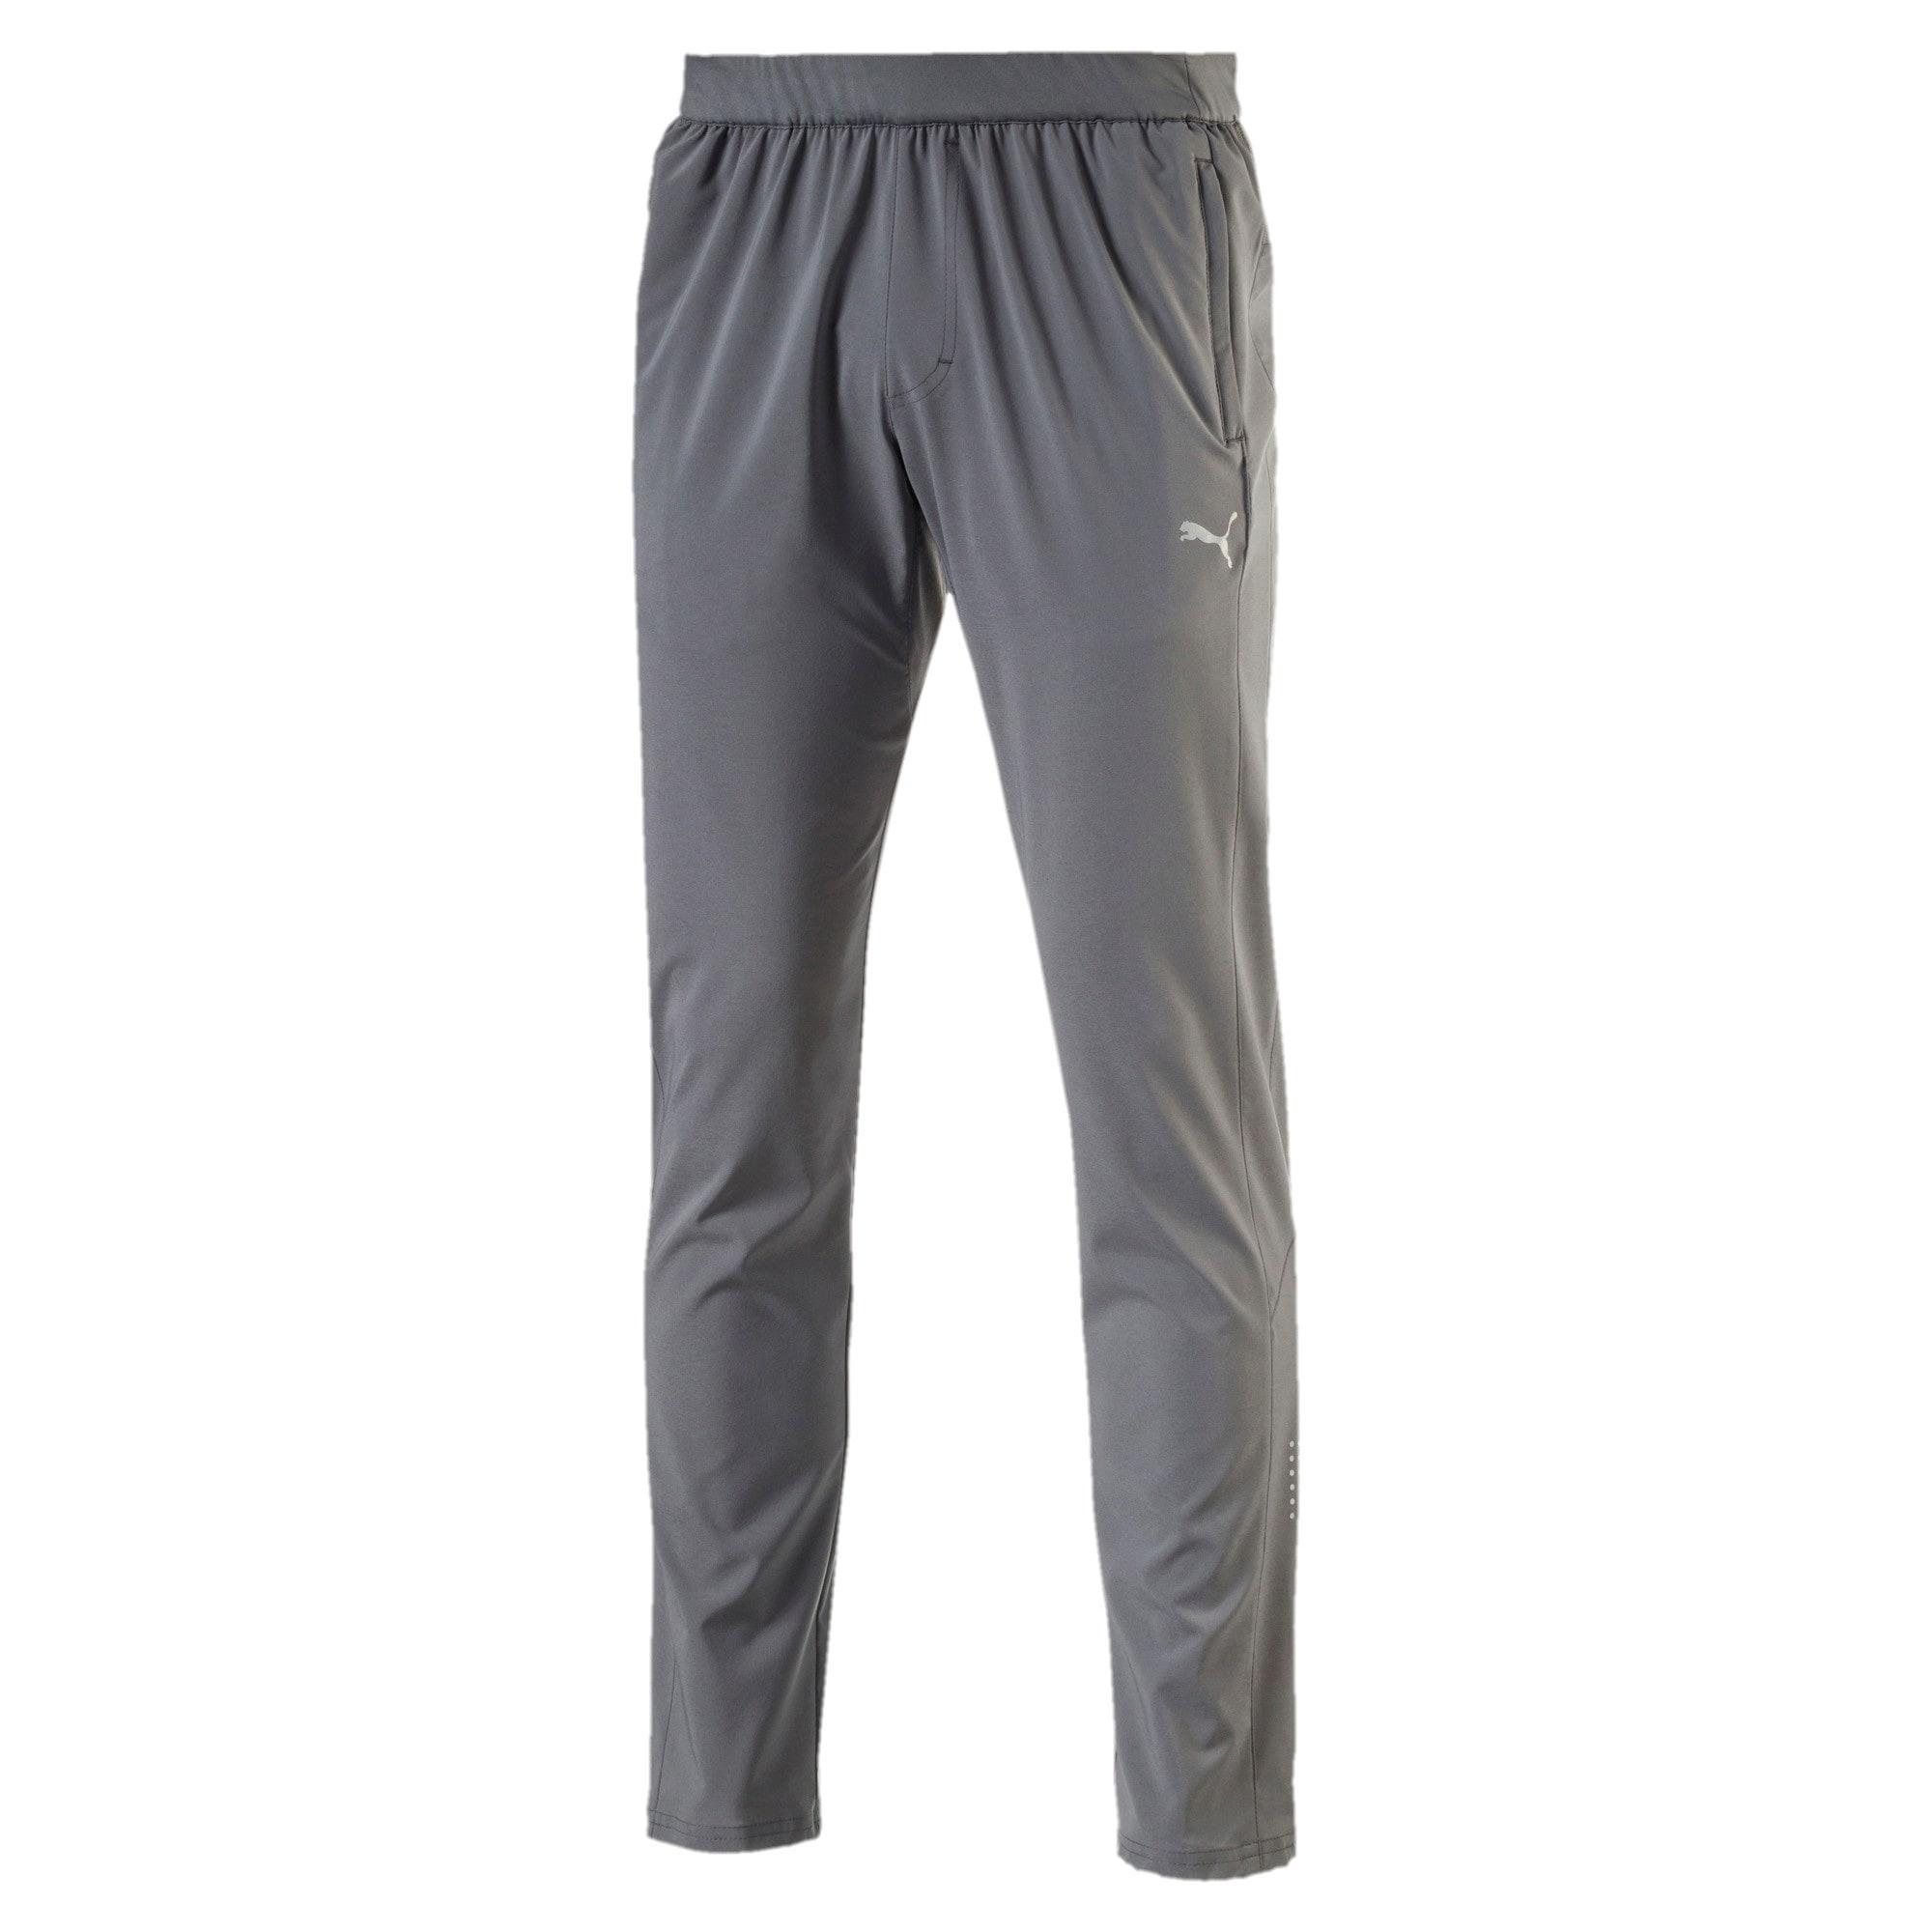 Thumbnail 3 of Running Men's Tapered Pants, QUIET SHADE, medium-IND